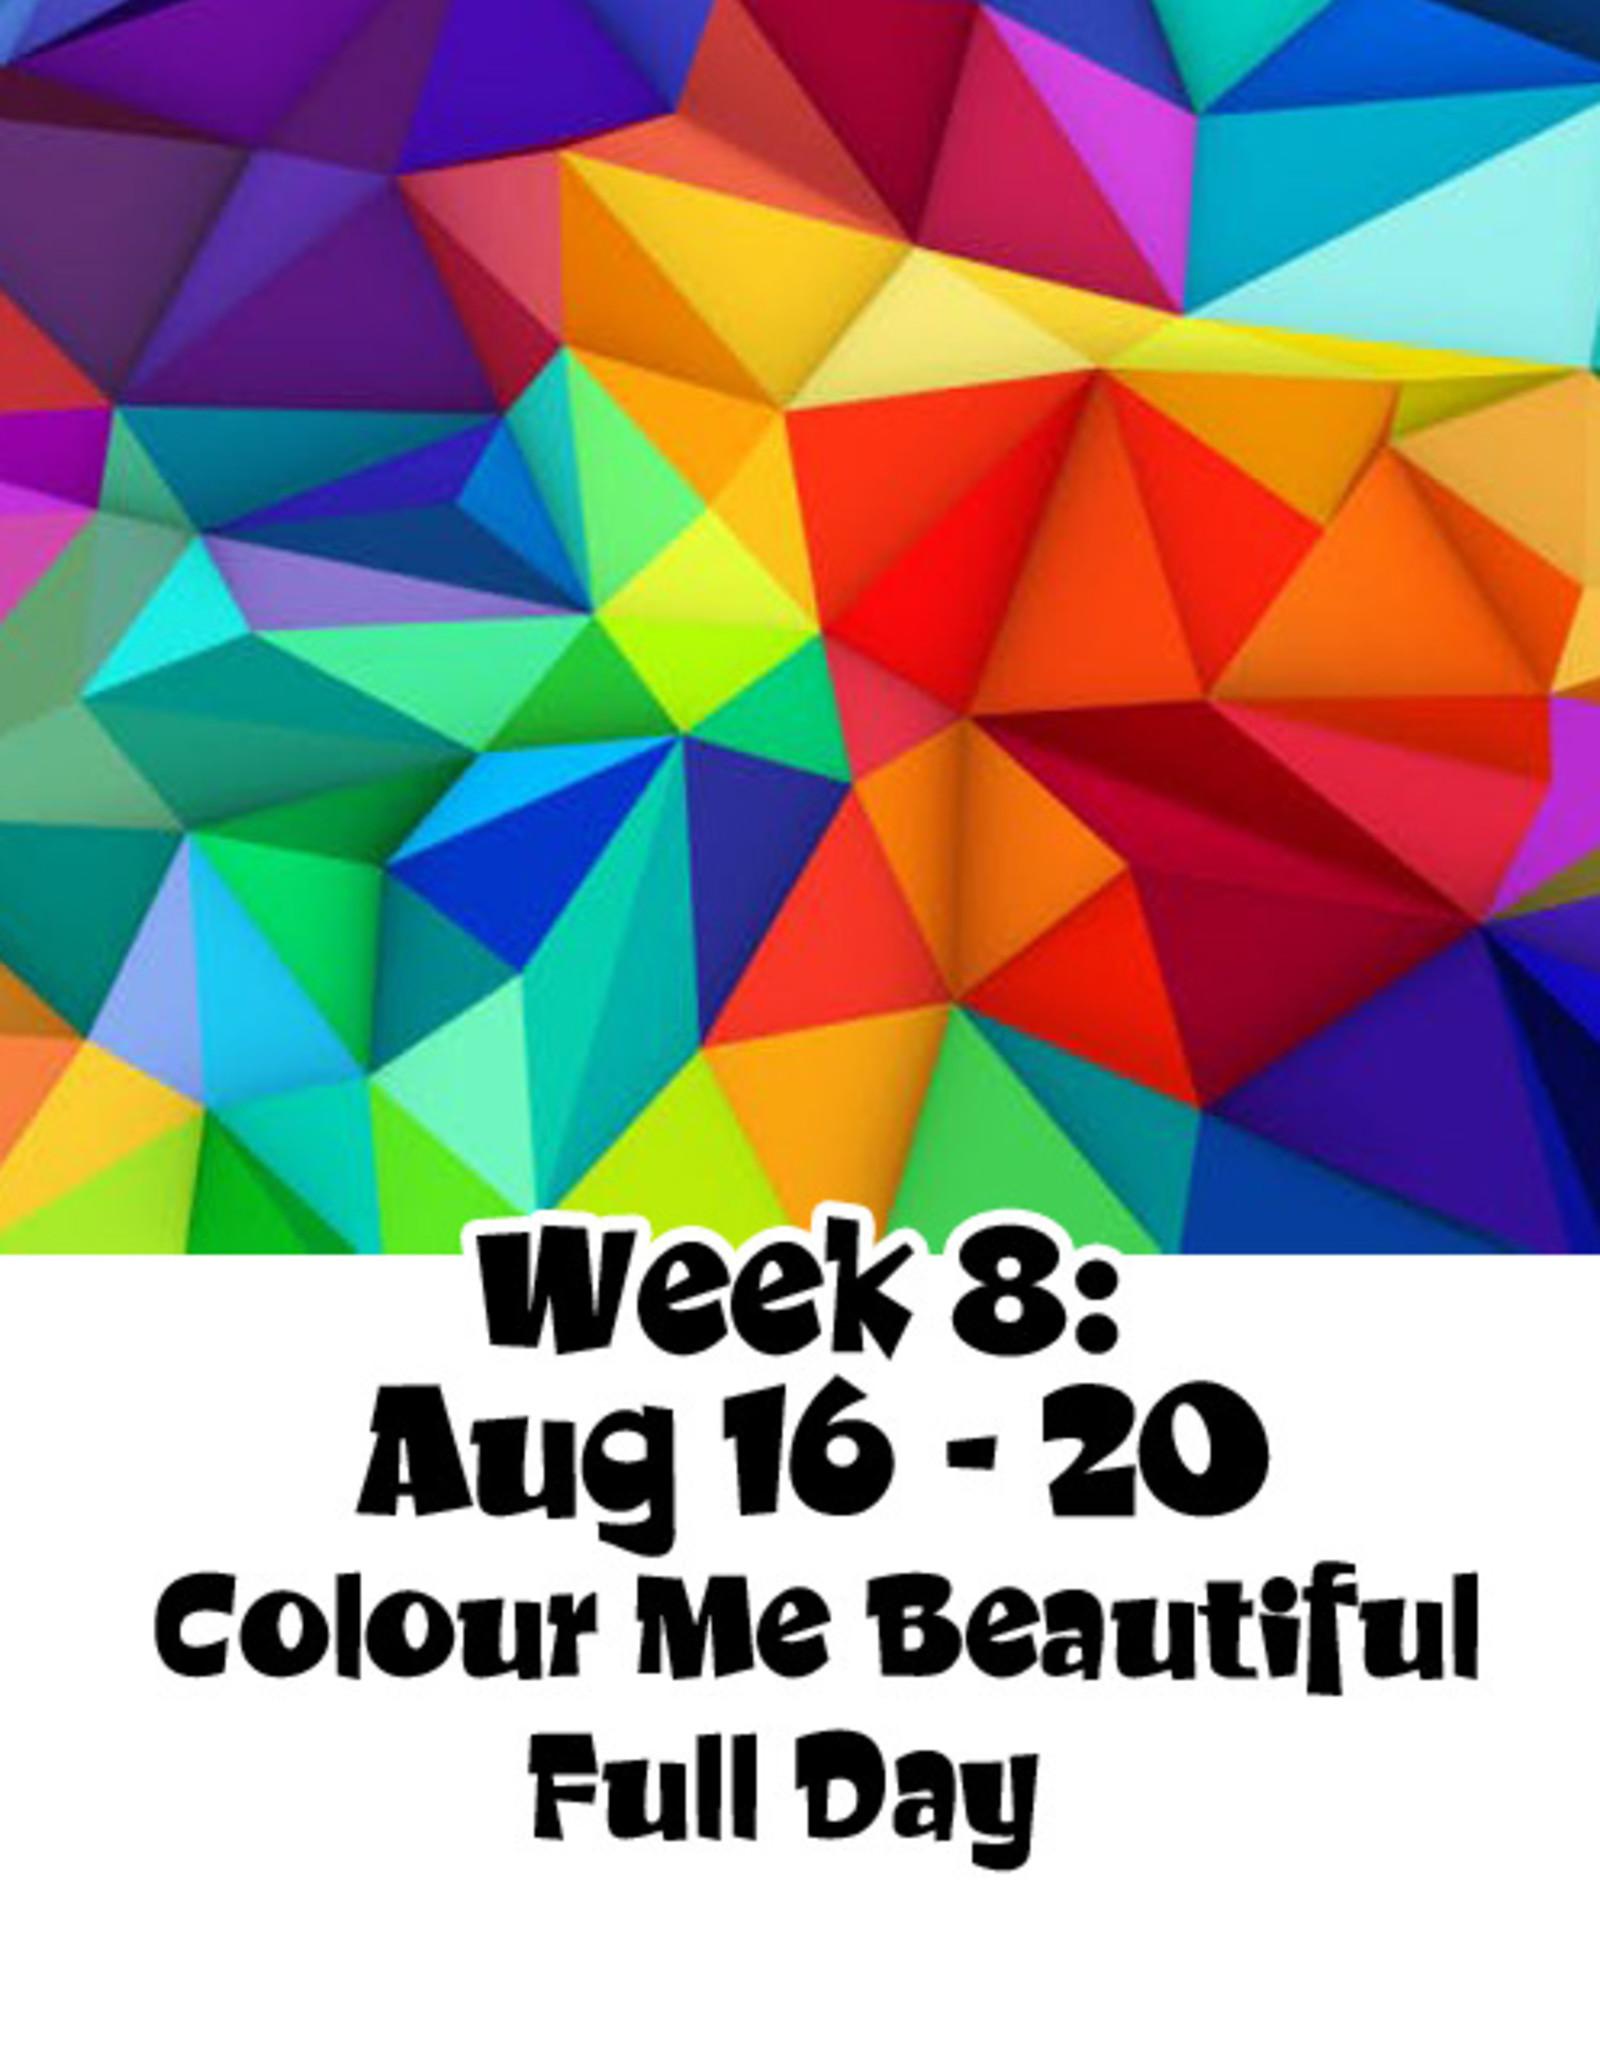 2021 Art Camp 2021 Art Camp Wk Eight Aug 16 - Aug 20 Full Day